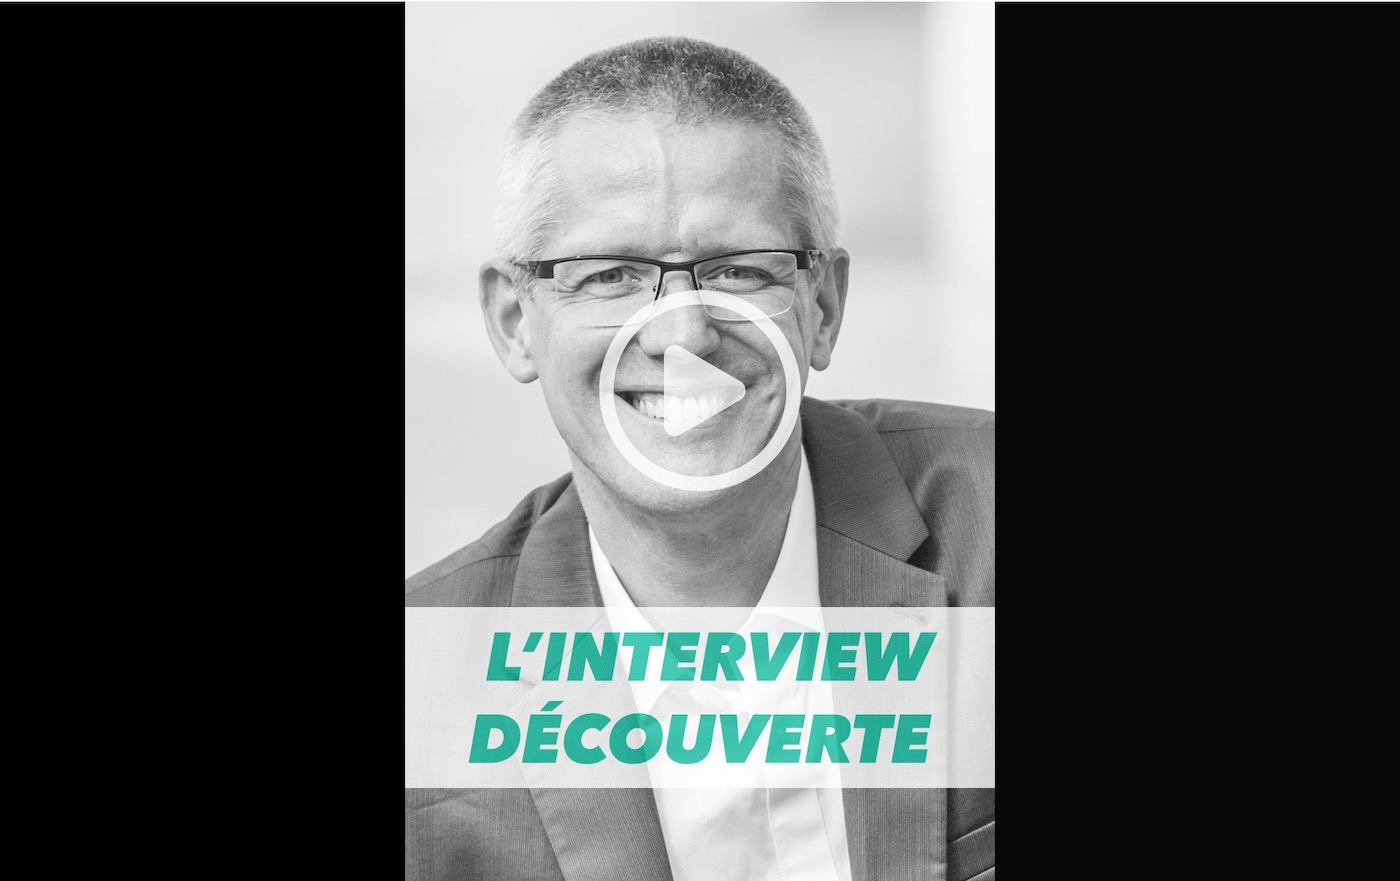 interview decouverte francis mahut eficiens V4